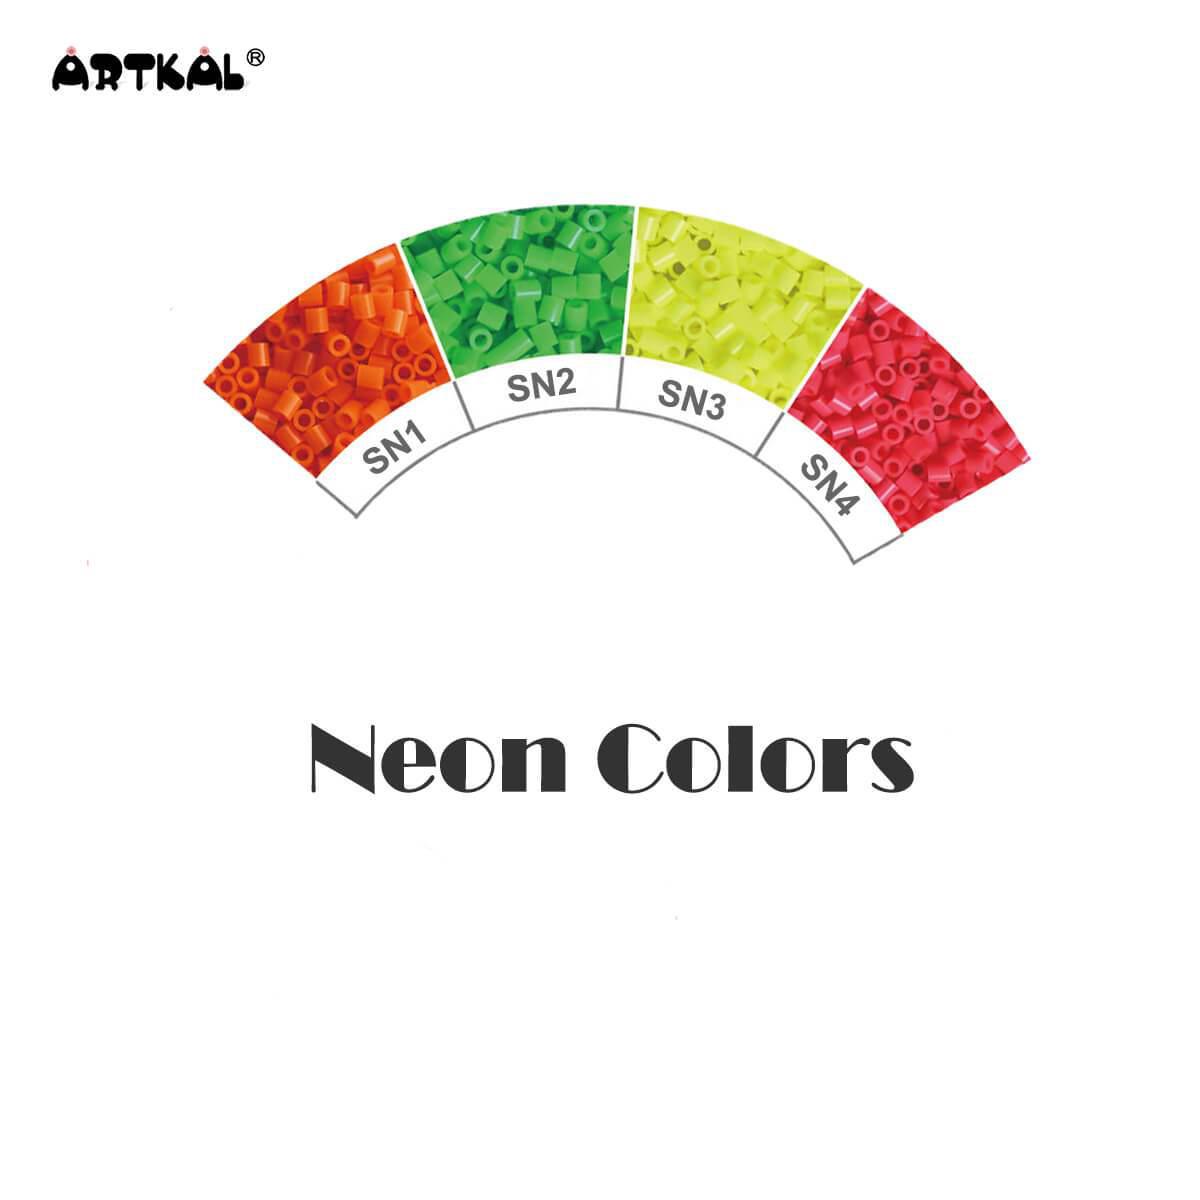 20-artkal-beads-s-5mm-sn-2000x-1-.jpg